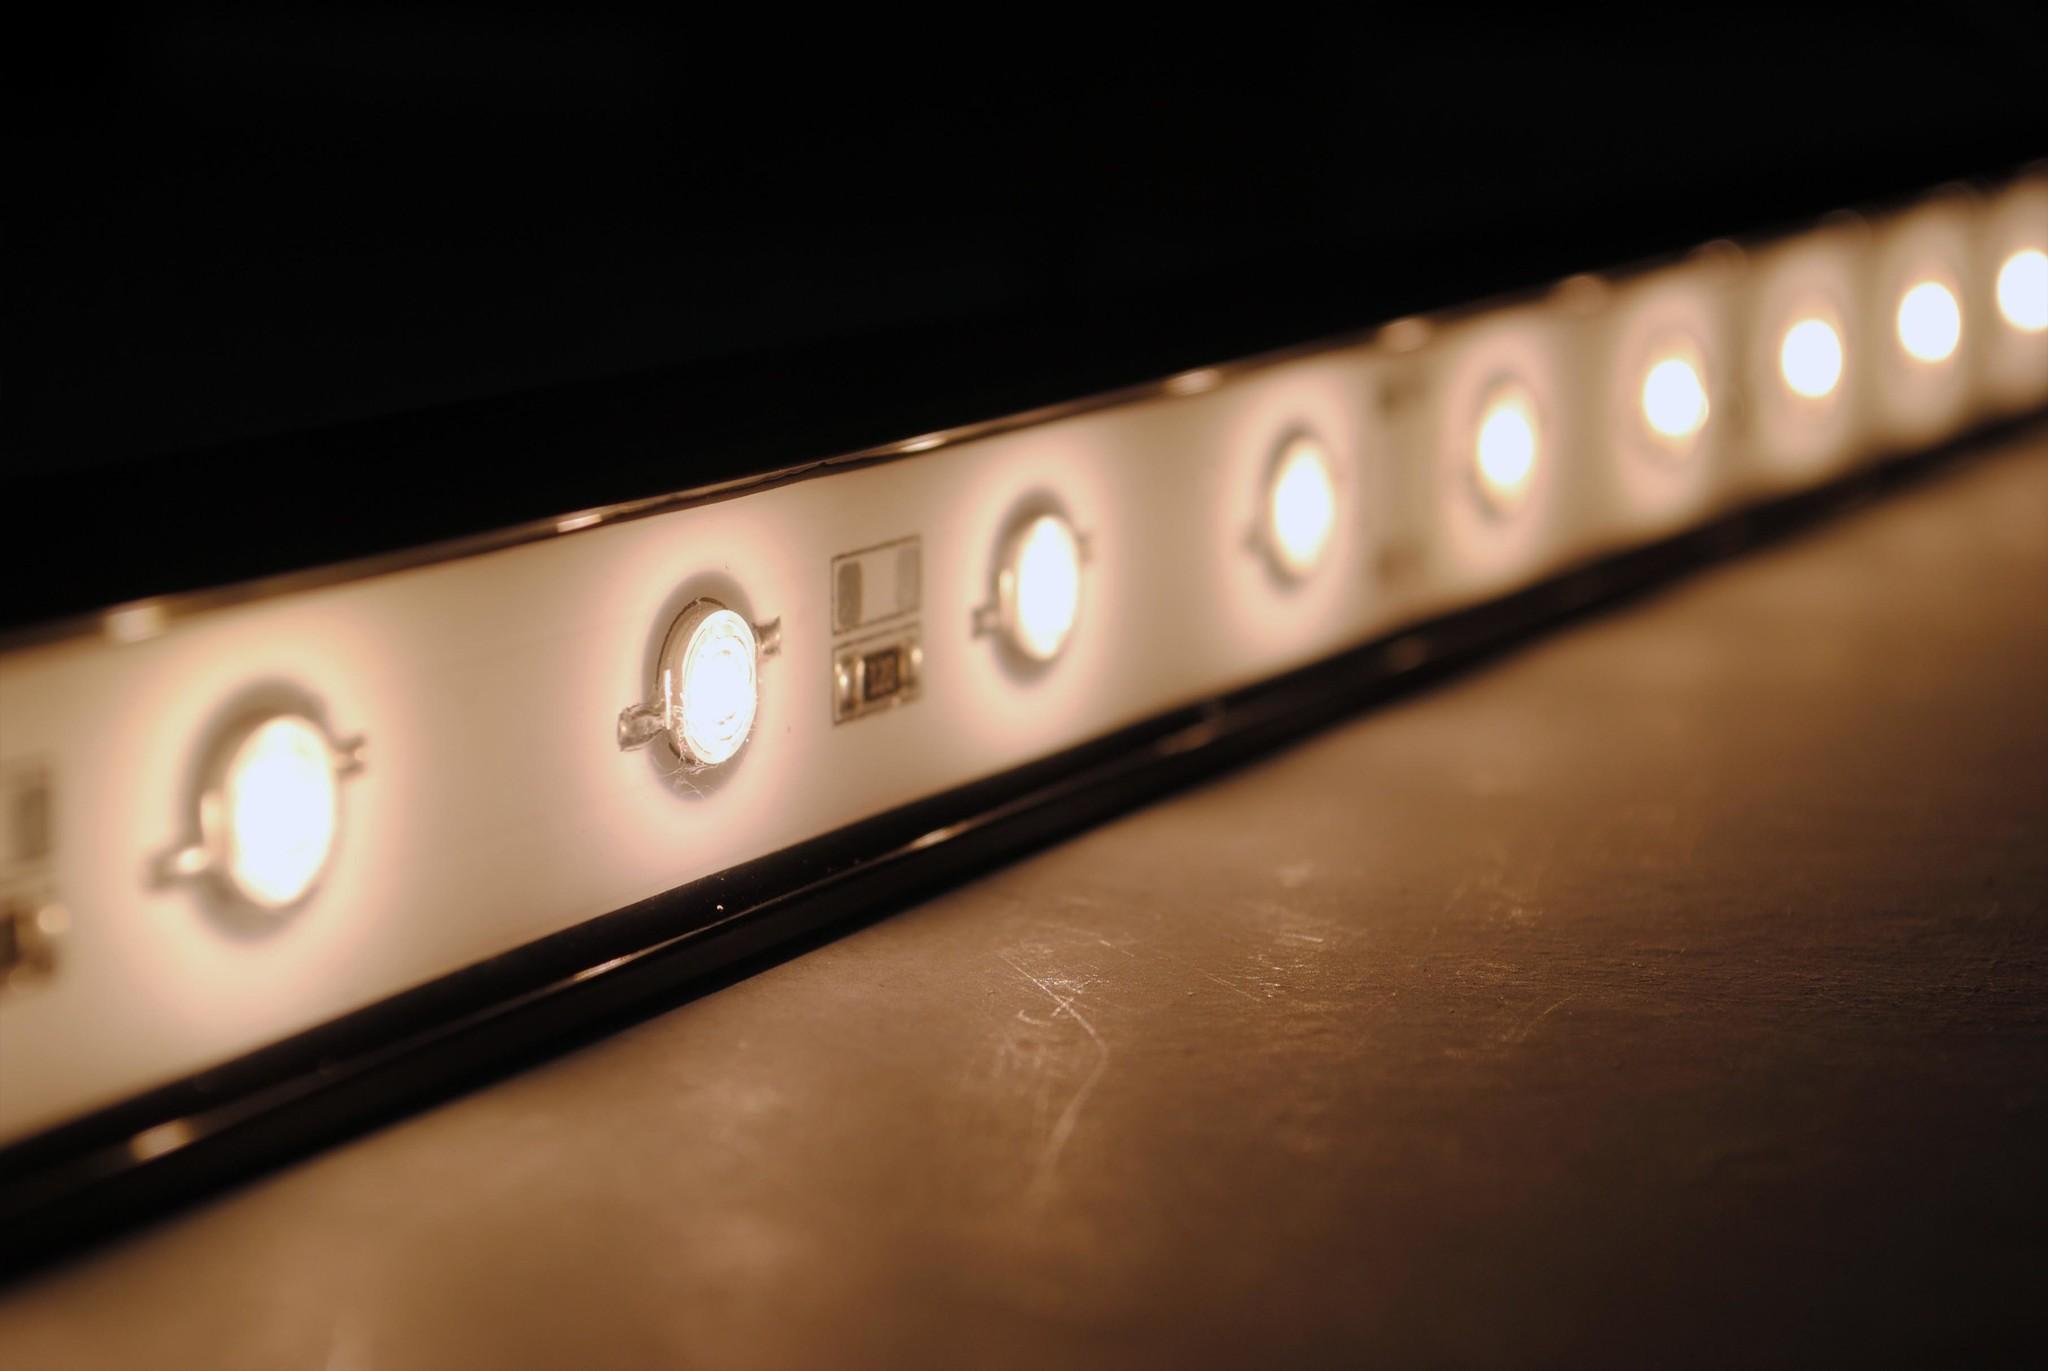 LEDBAR PRO de 50 cm blanco cálido IP68 Impermeable 12W 24V